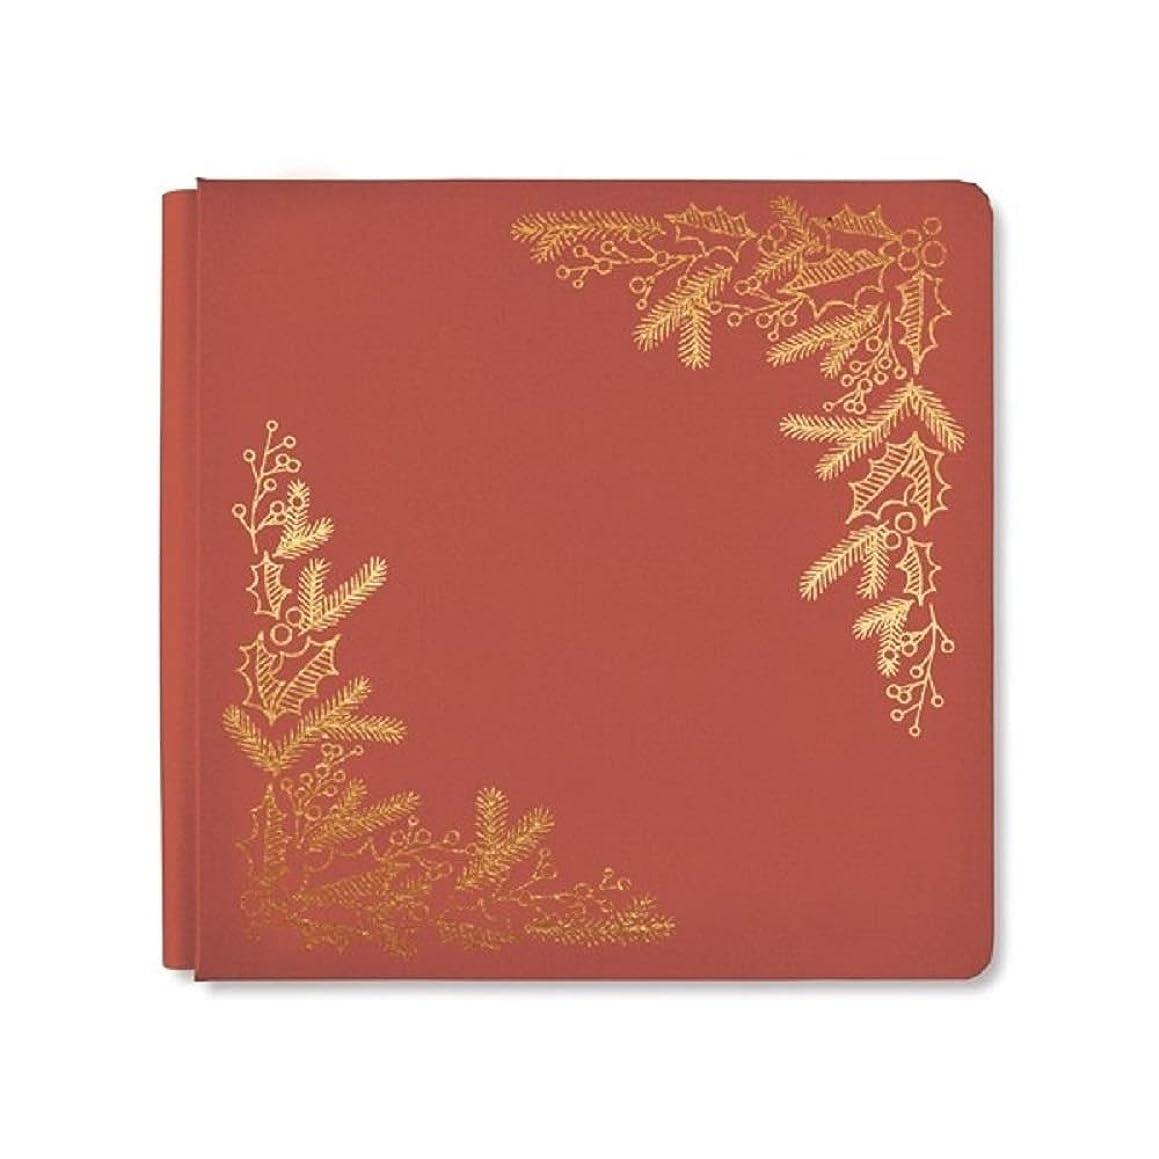 12x12 Antique Red Season's Greetings Album Cover